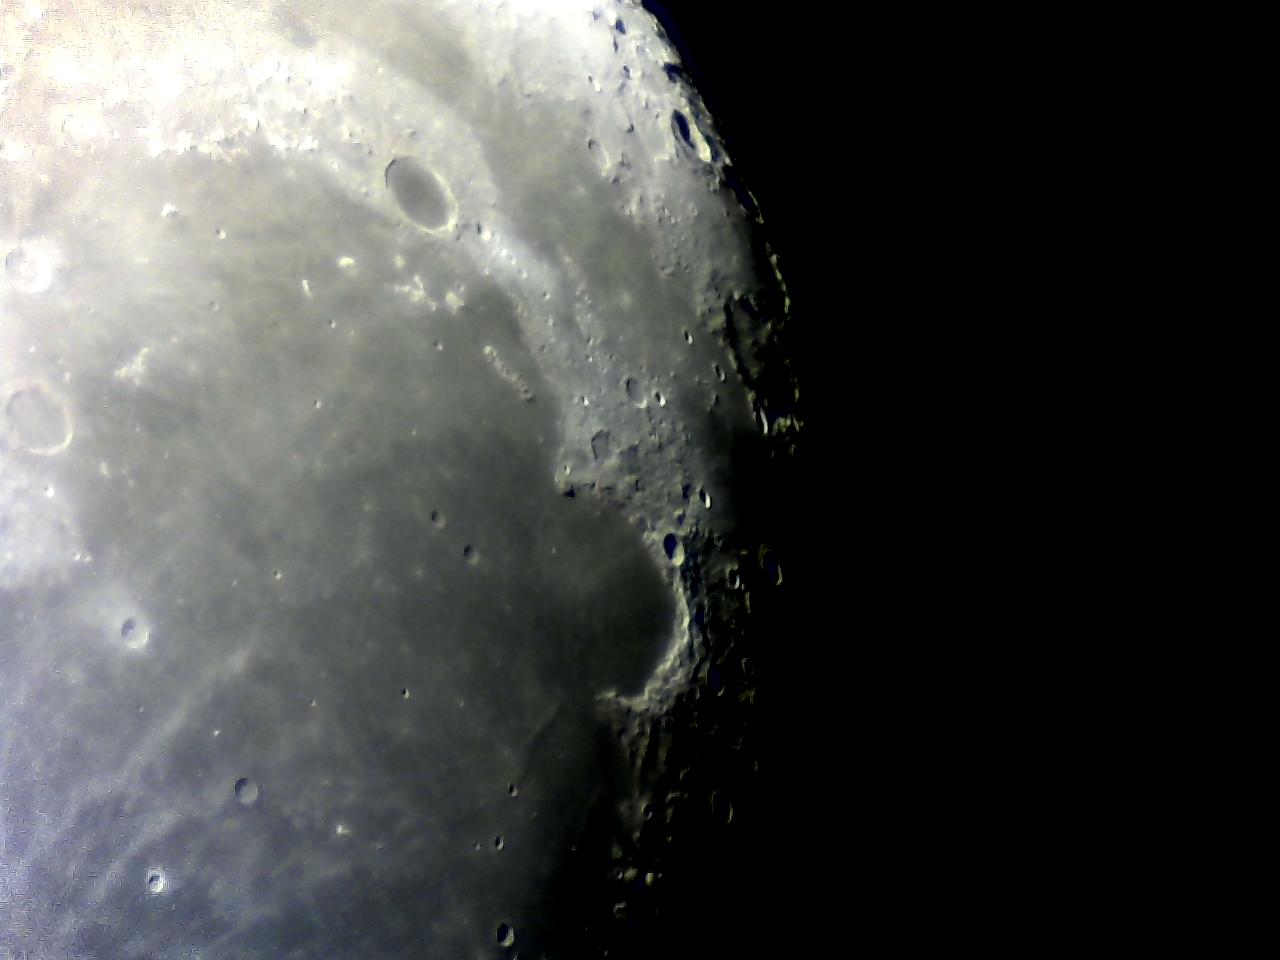 Primeiras fotos Lua skywatcher 70mm Lua%2B-%2Bwebcam%2B%252817%2529